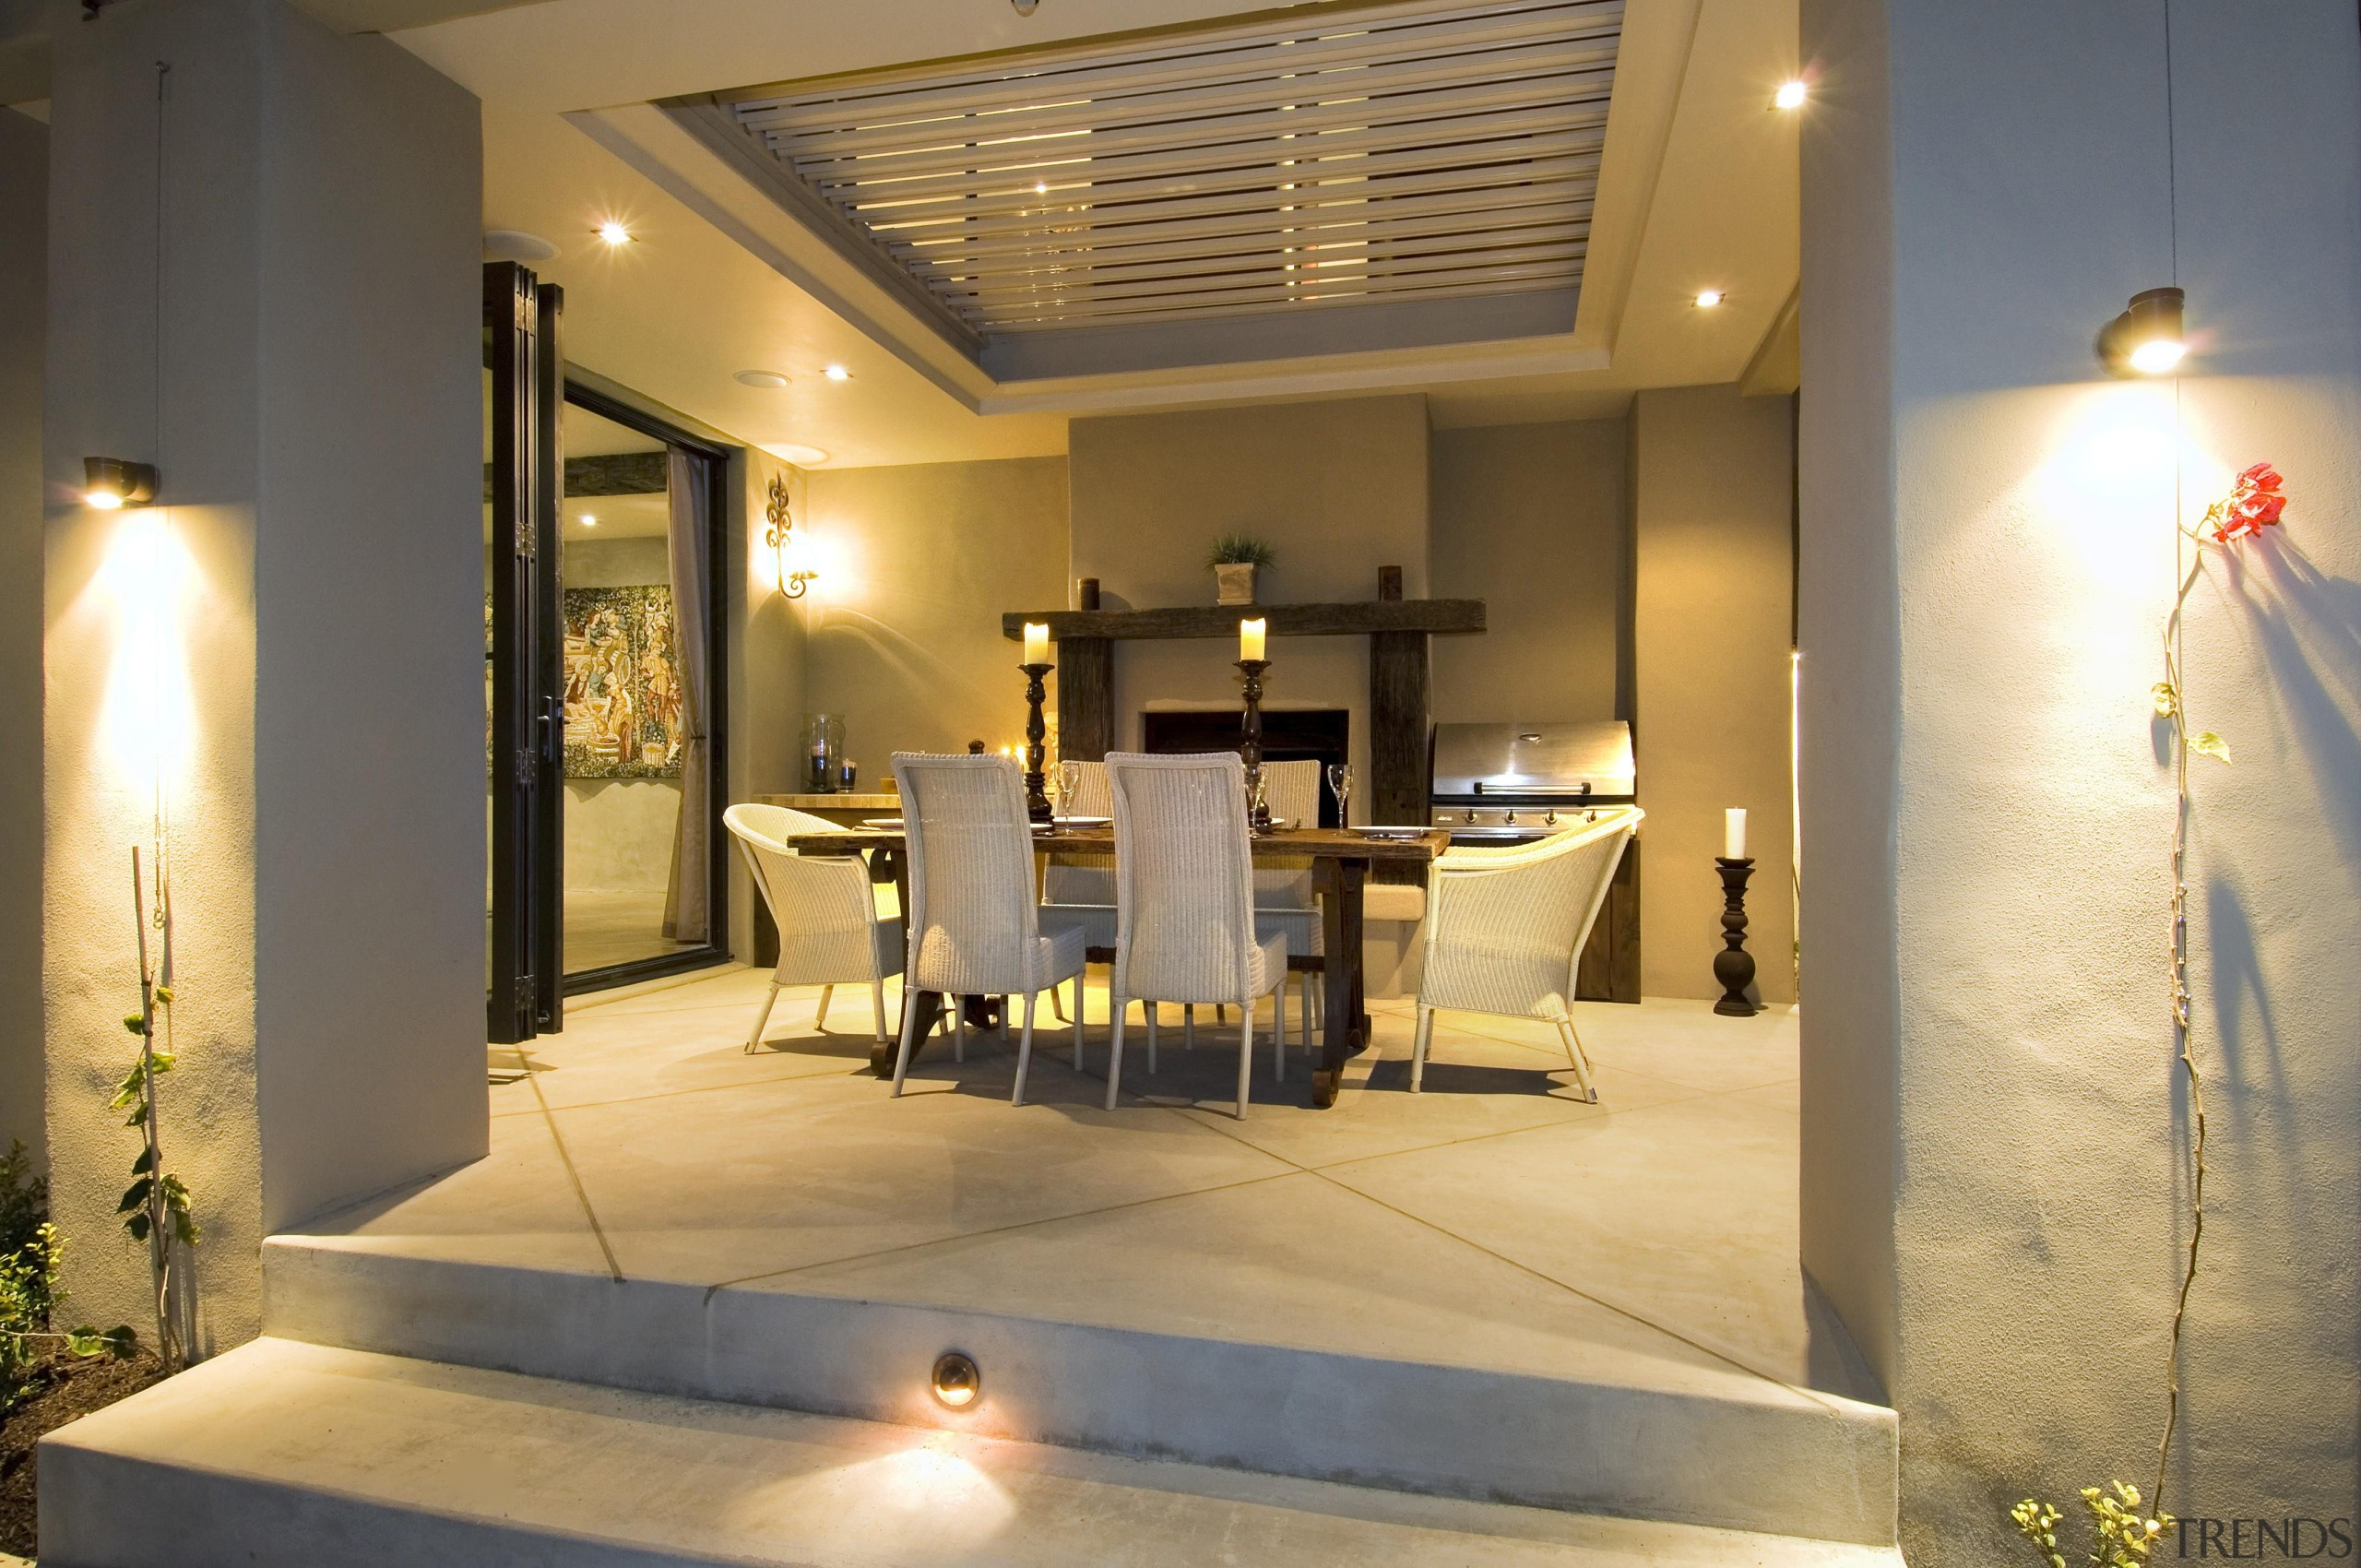 162mangawhai 4 - mangawhai_4 - ceiling | interior ceiling, interior design, lighting, lobby, real estate, brown, orange